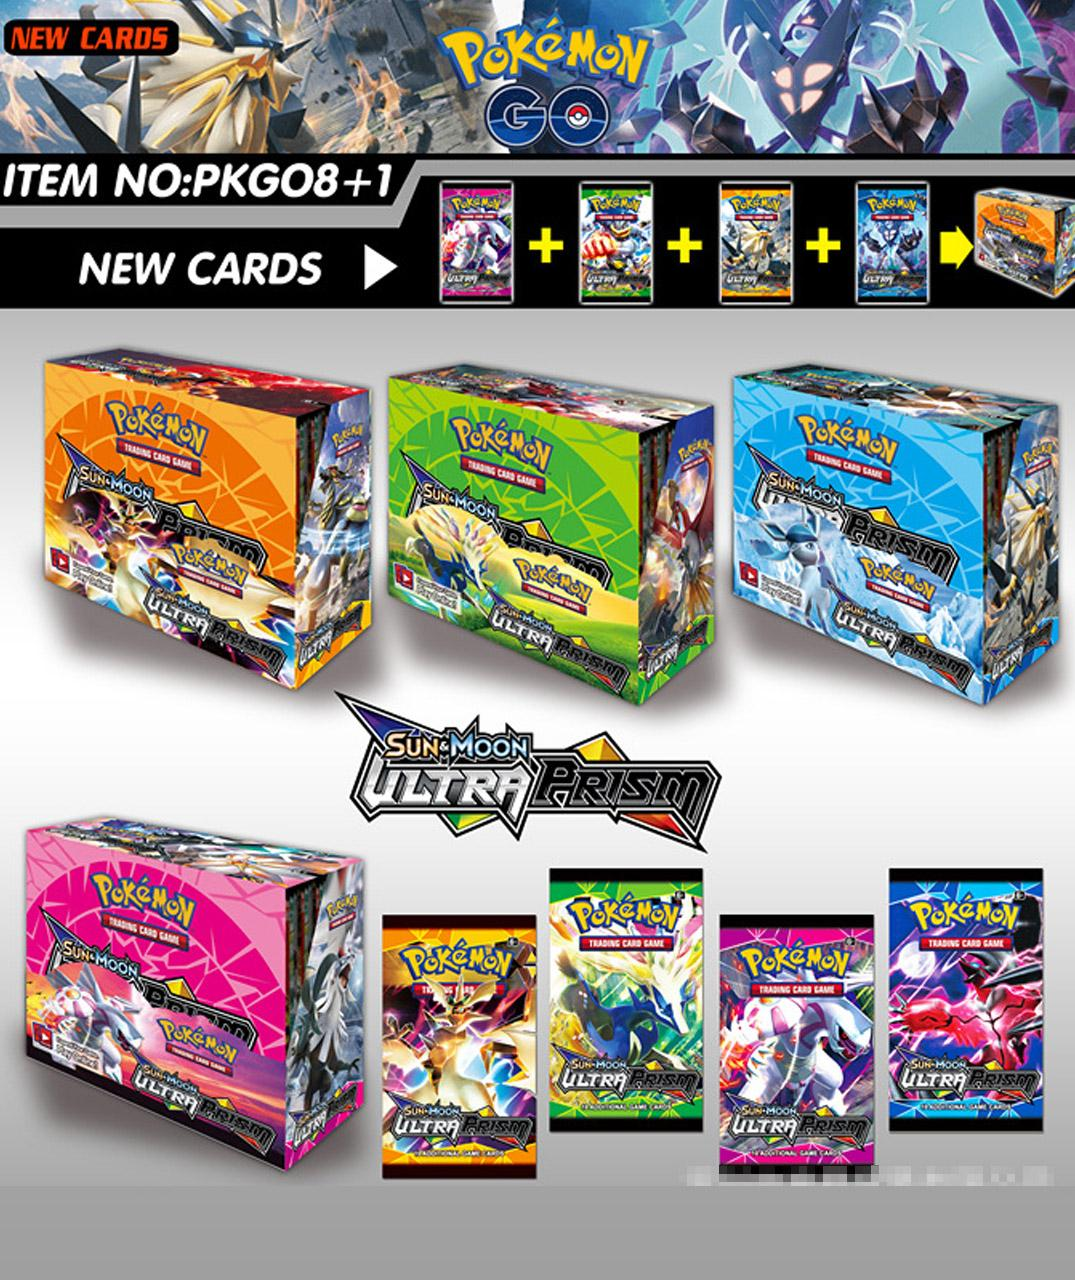 324pcs-takara-tomy-pet-font-b-pokemon-b-font-cards-high-end-gift-box-font-b-pokemon-b-font-cards-the-toy-of-children